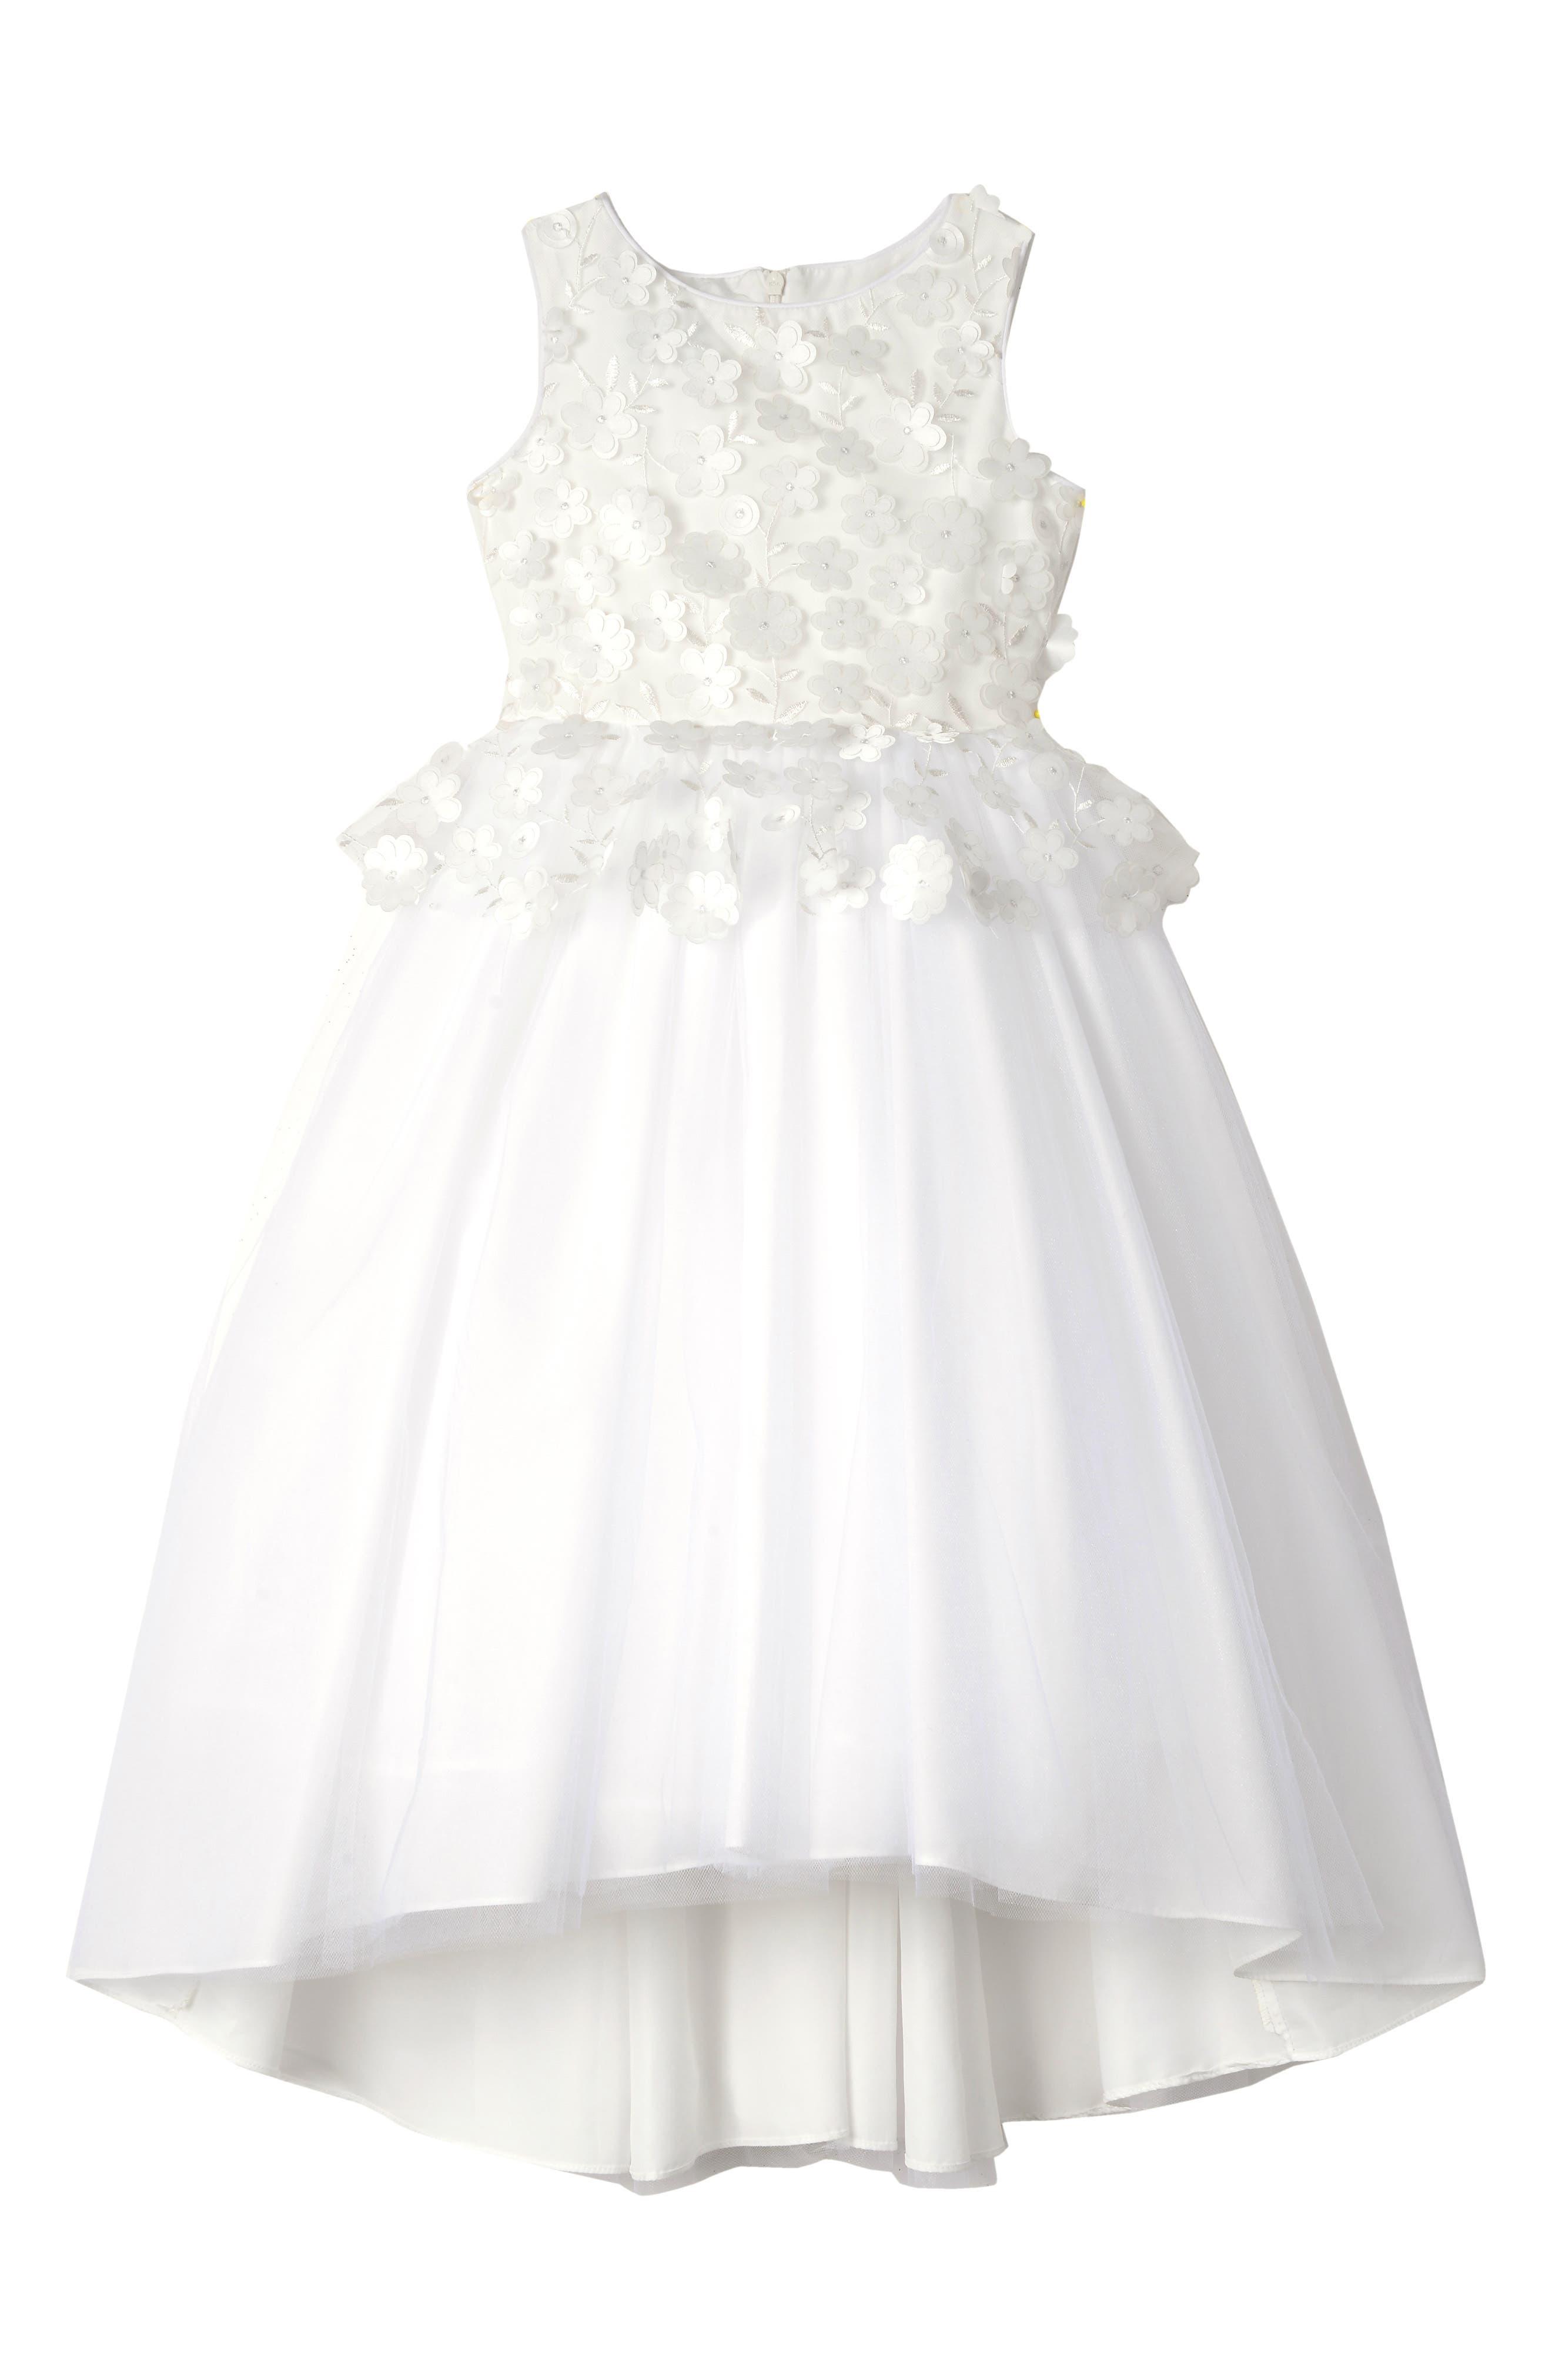 BADGLEY MISCHKA COLLECTION Badgley Mischka 3D Flower Peplum Dress, Main, color, WHITE